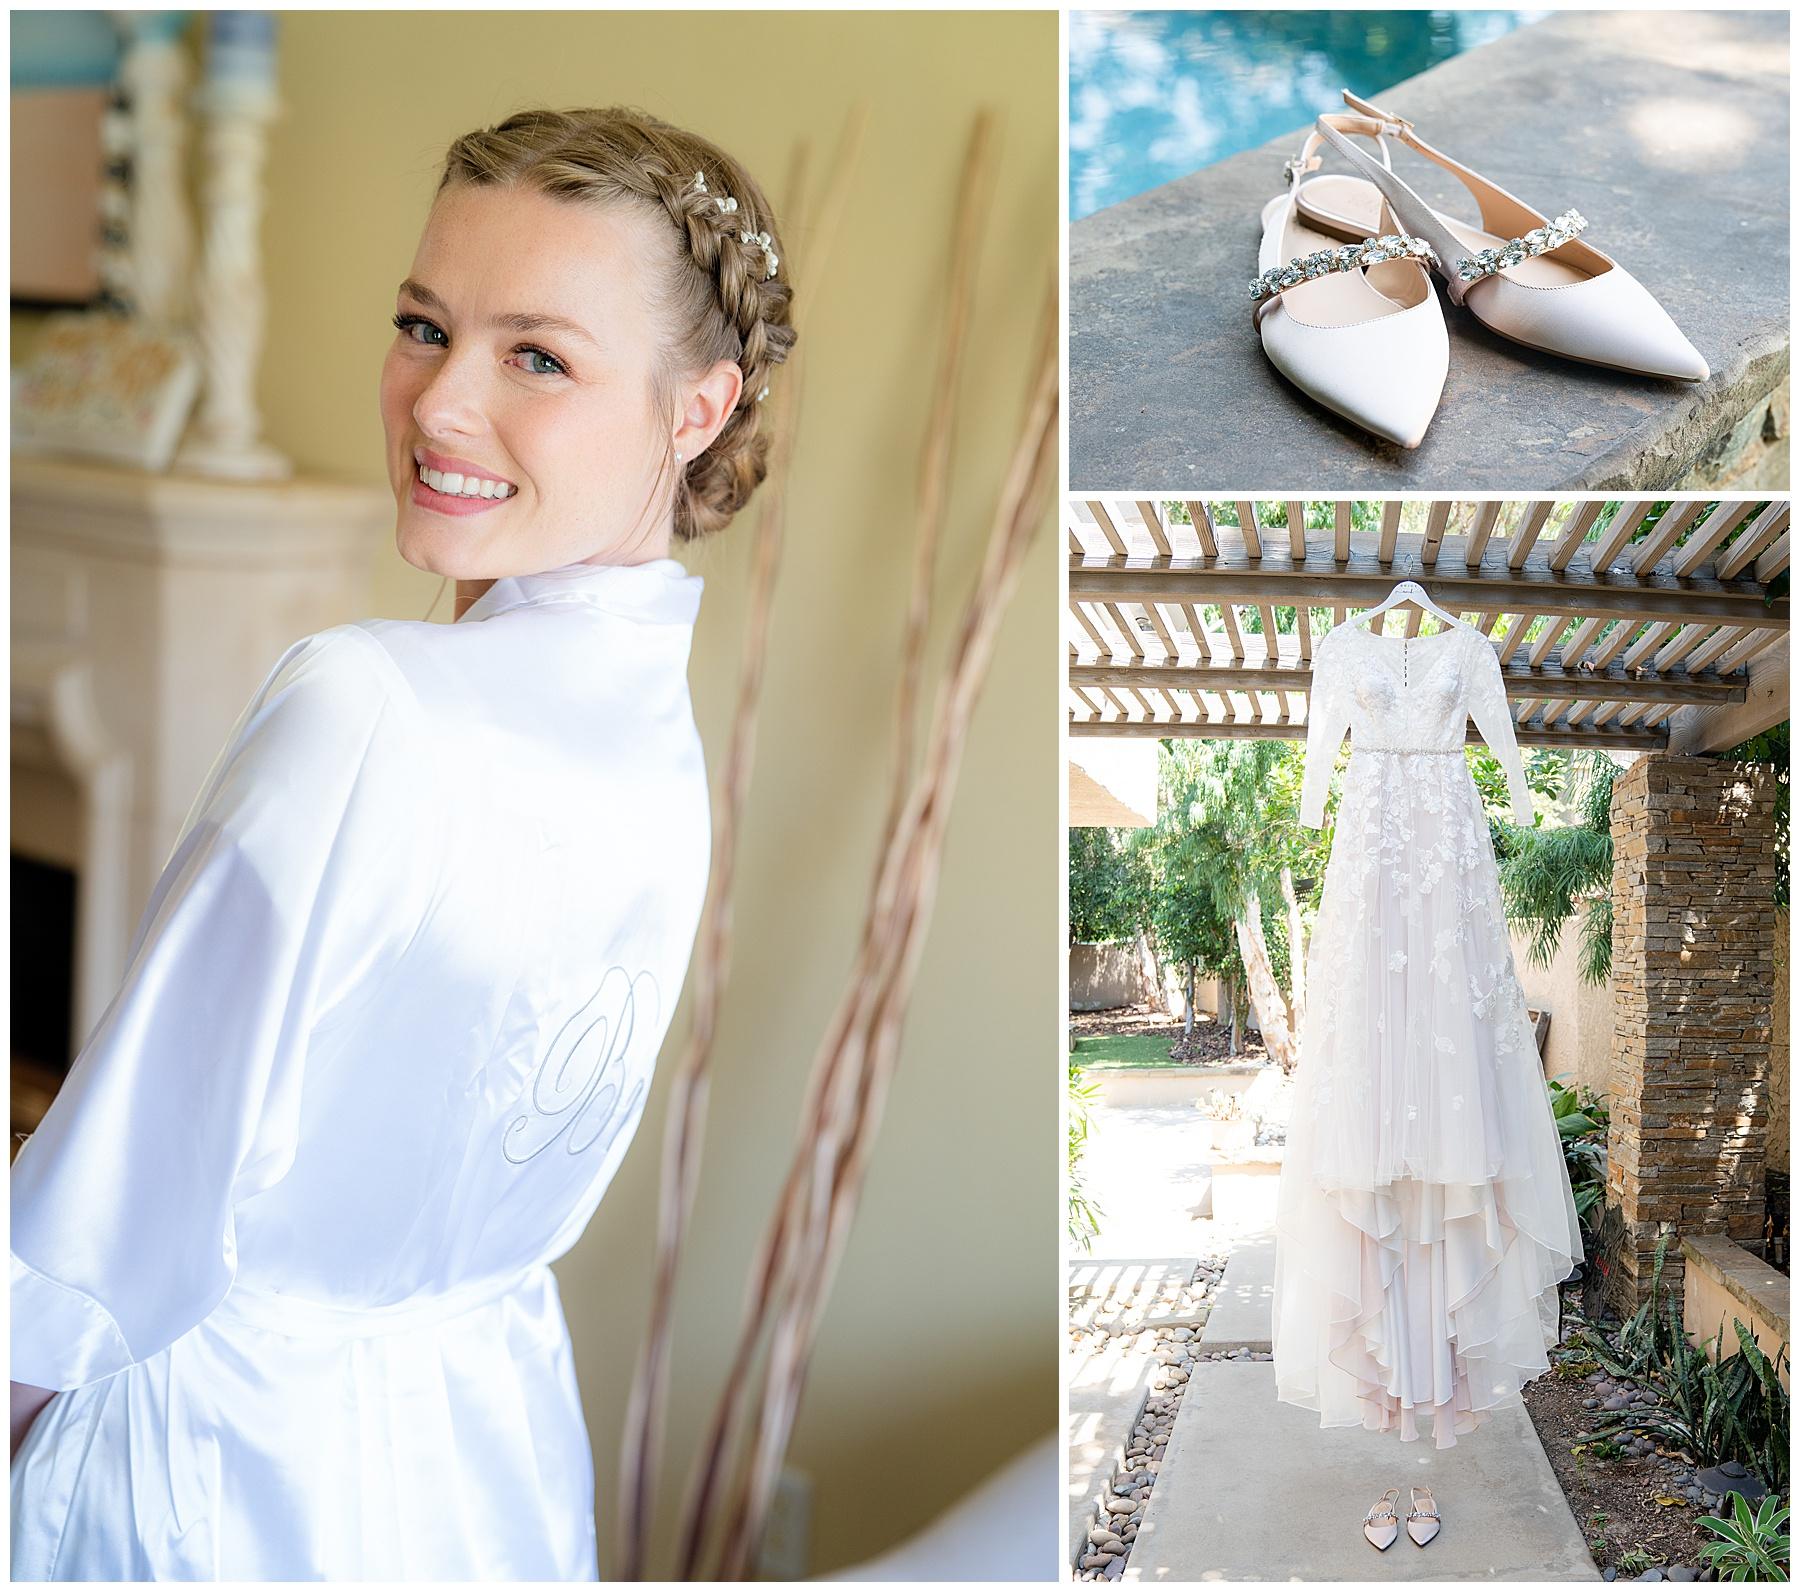 wedding hairdo with princess leia braids